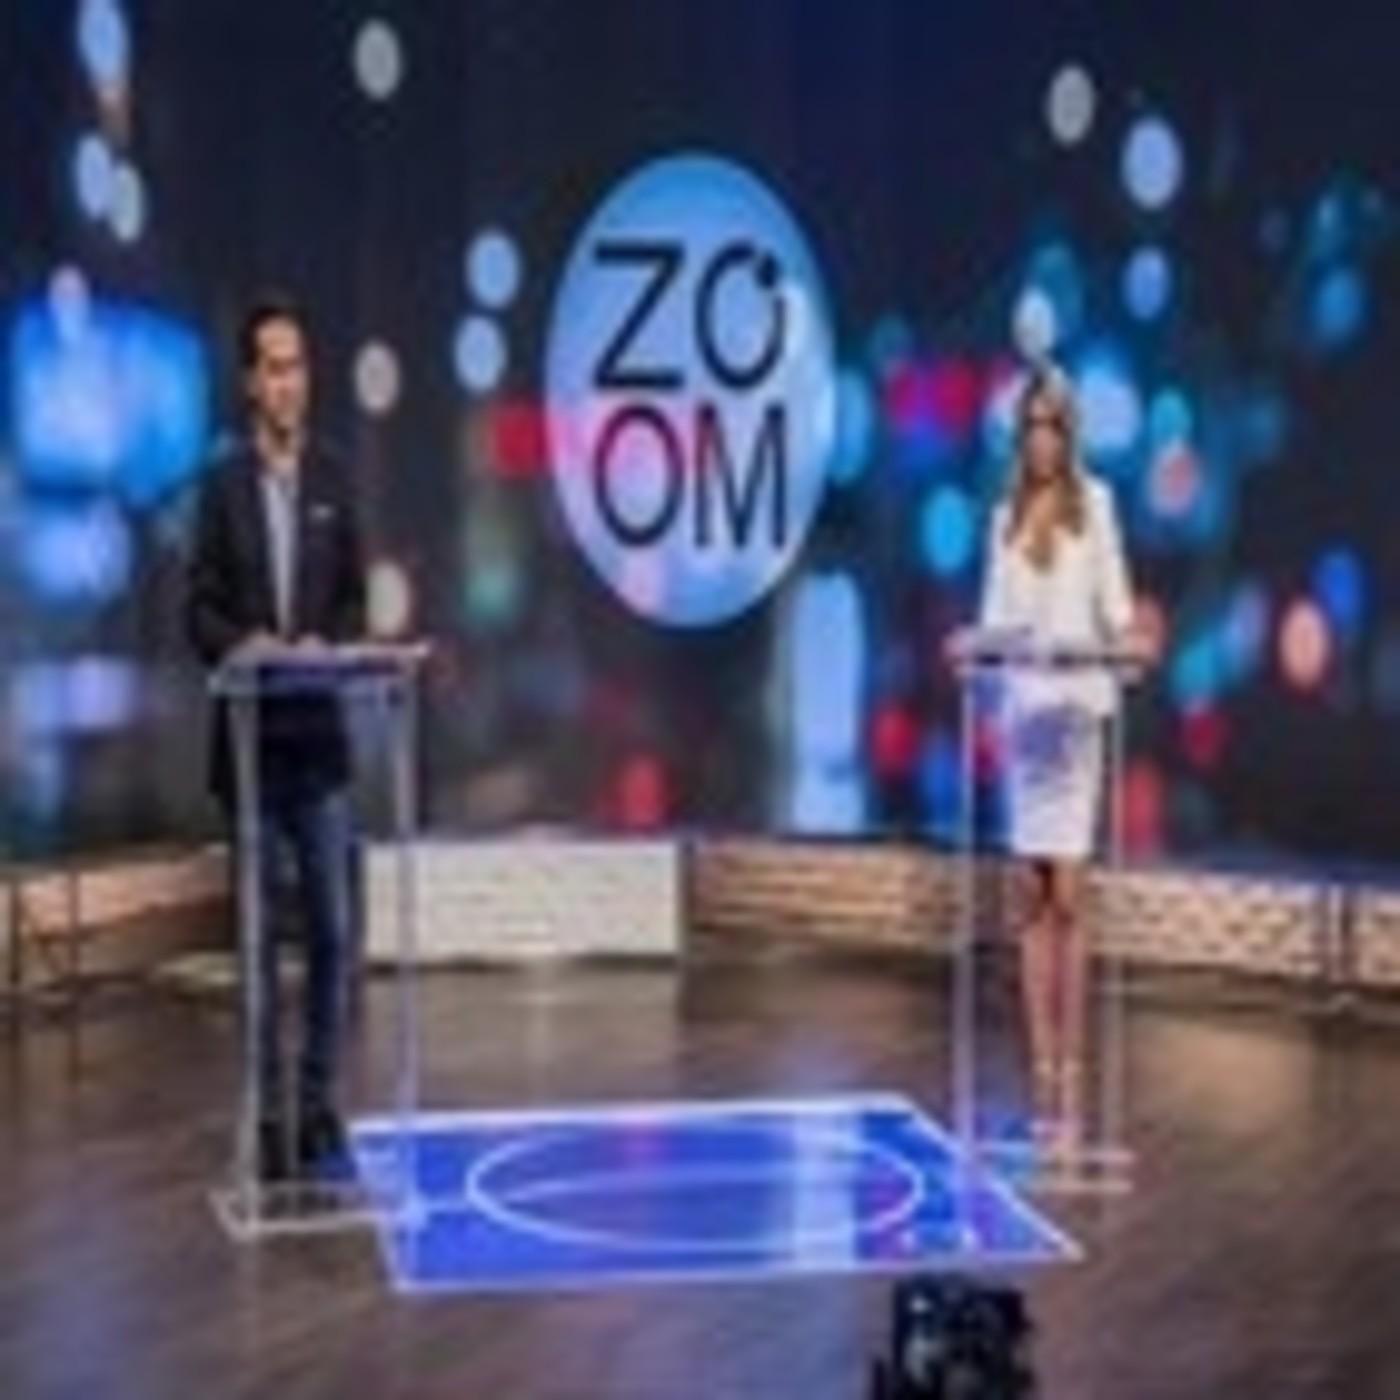 Escucha Cuarto milenio Zoom - iVoox